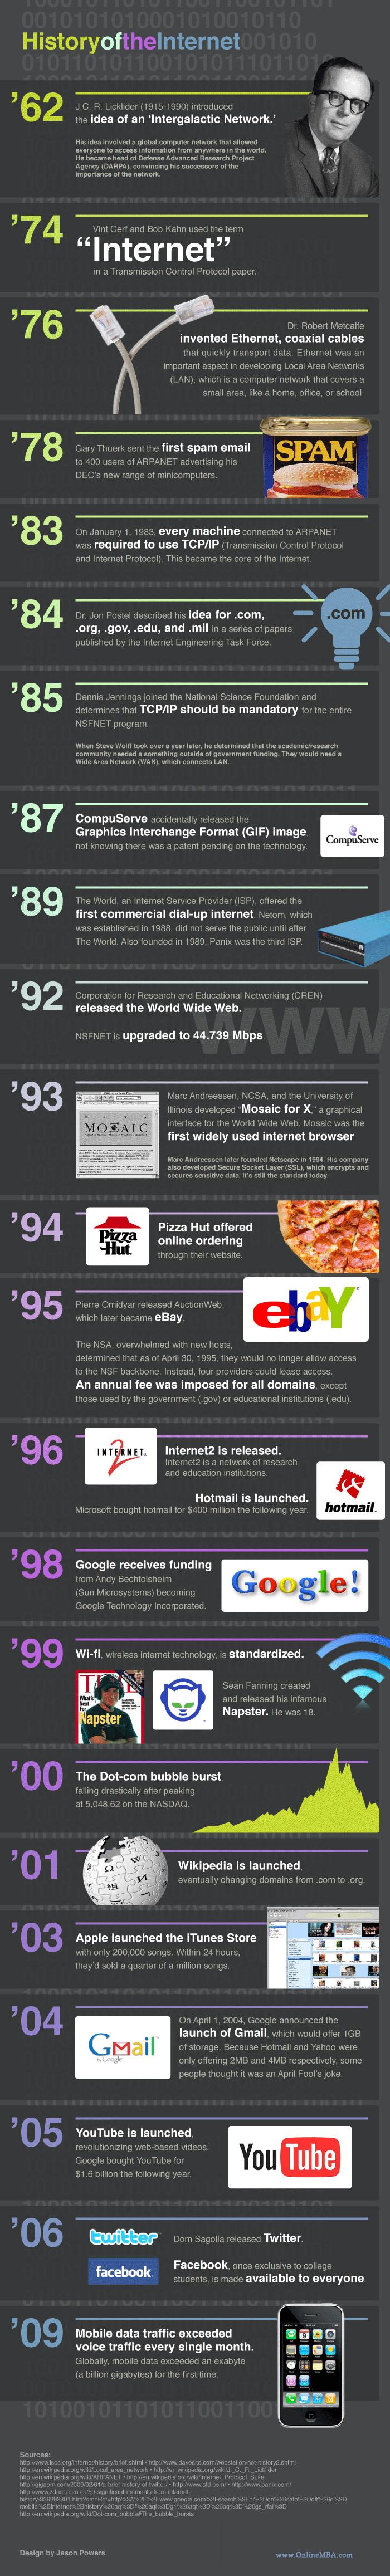 internet-history